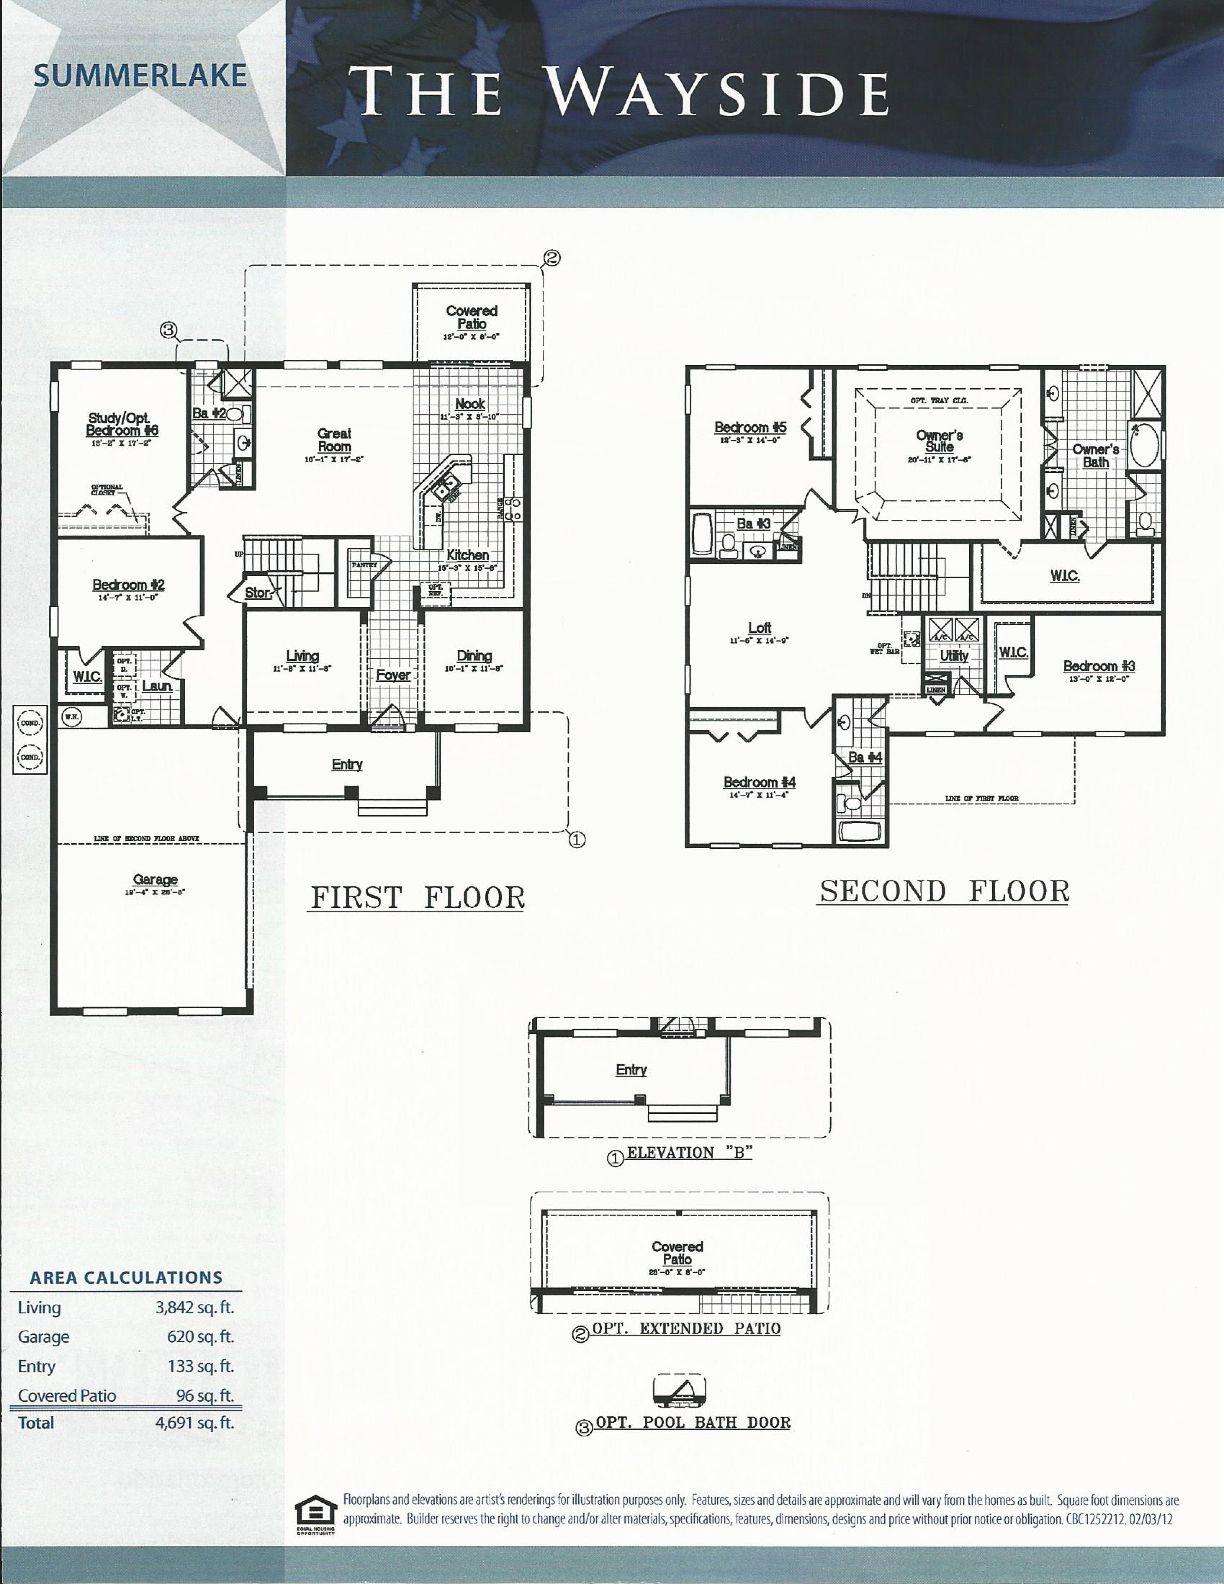 Summerlake Dr Horton Homes Wayside Floor Plan In Winter Garden Fl Horton Homes Dr Horton Homes Winter Garden